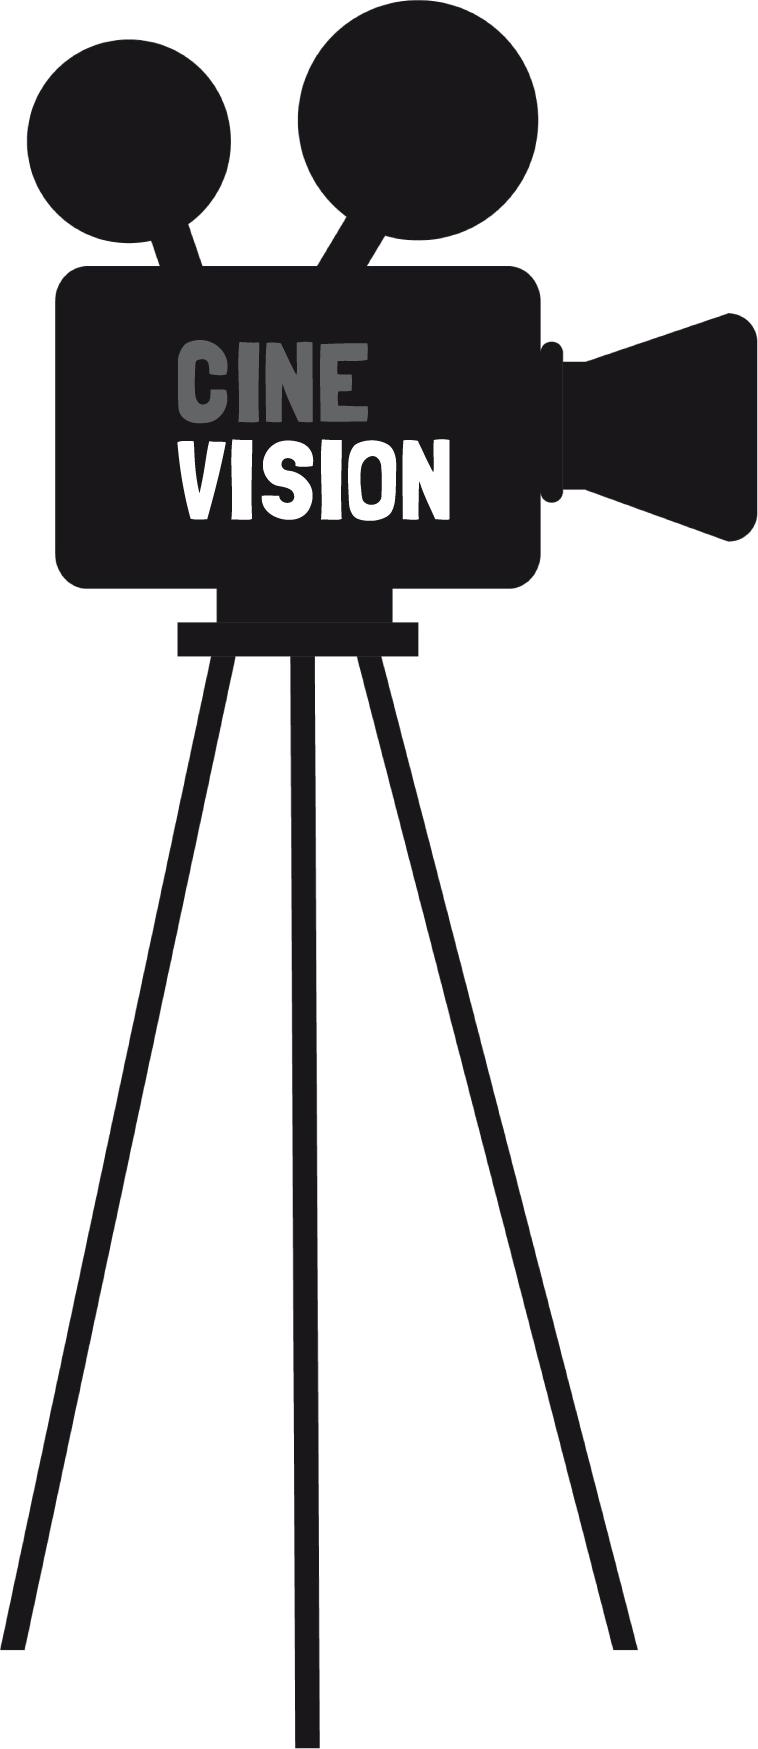 Vídeos institucionais Vídeos para endomarketing Vídeos motivacionais Vídeos de treinamento Vídeos de resultados de vendas Vídeos de lançamento de produtos Vídeos de tutorial de produtos Vídeos de depoimento de lideranças Vídeos de lançamento de projetos Vídeos conceituais para eventos Vídeos de palestras e meetings Vídeos para feiras e convenções